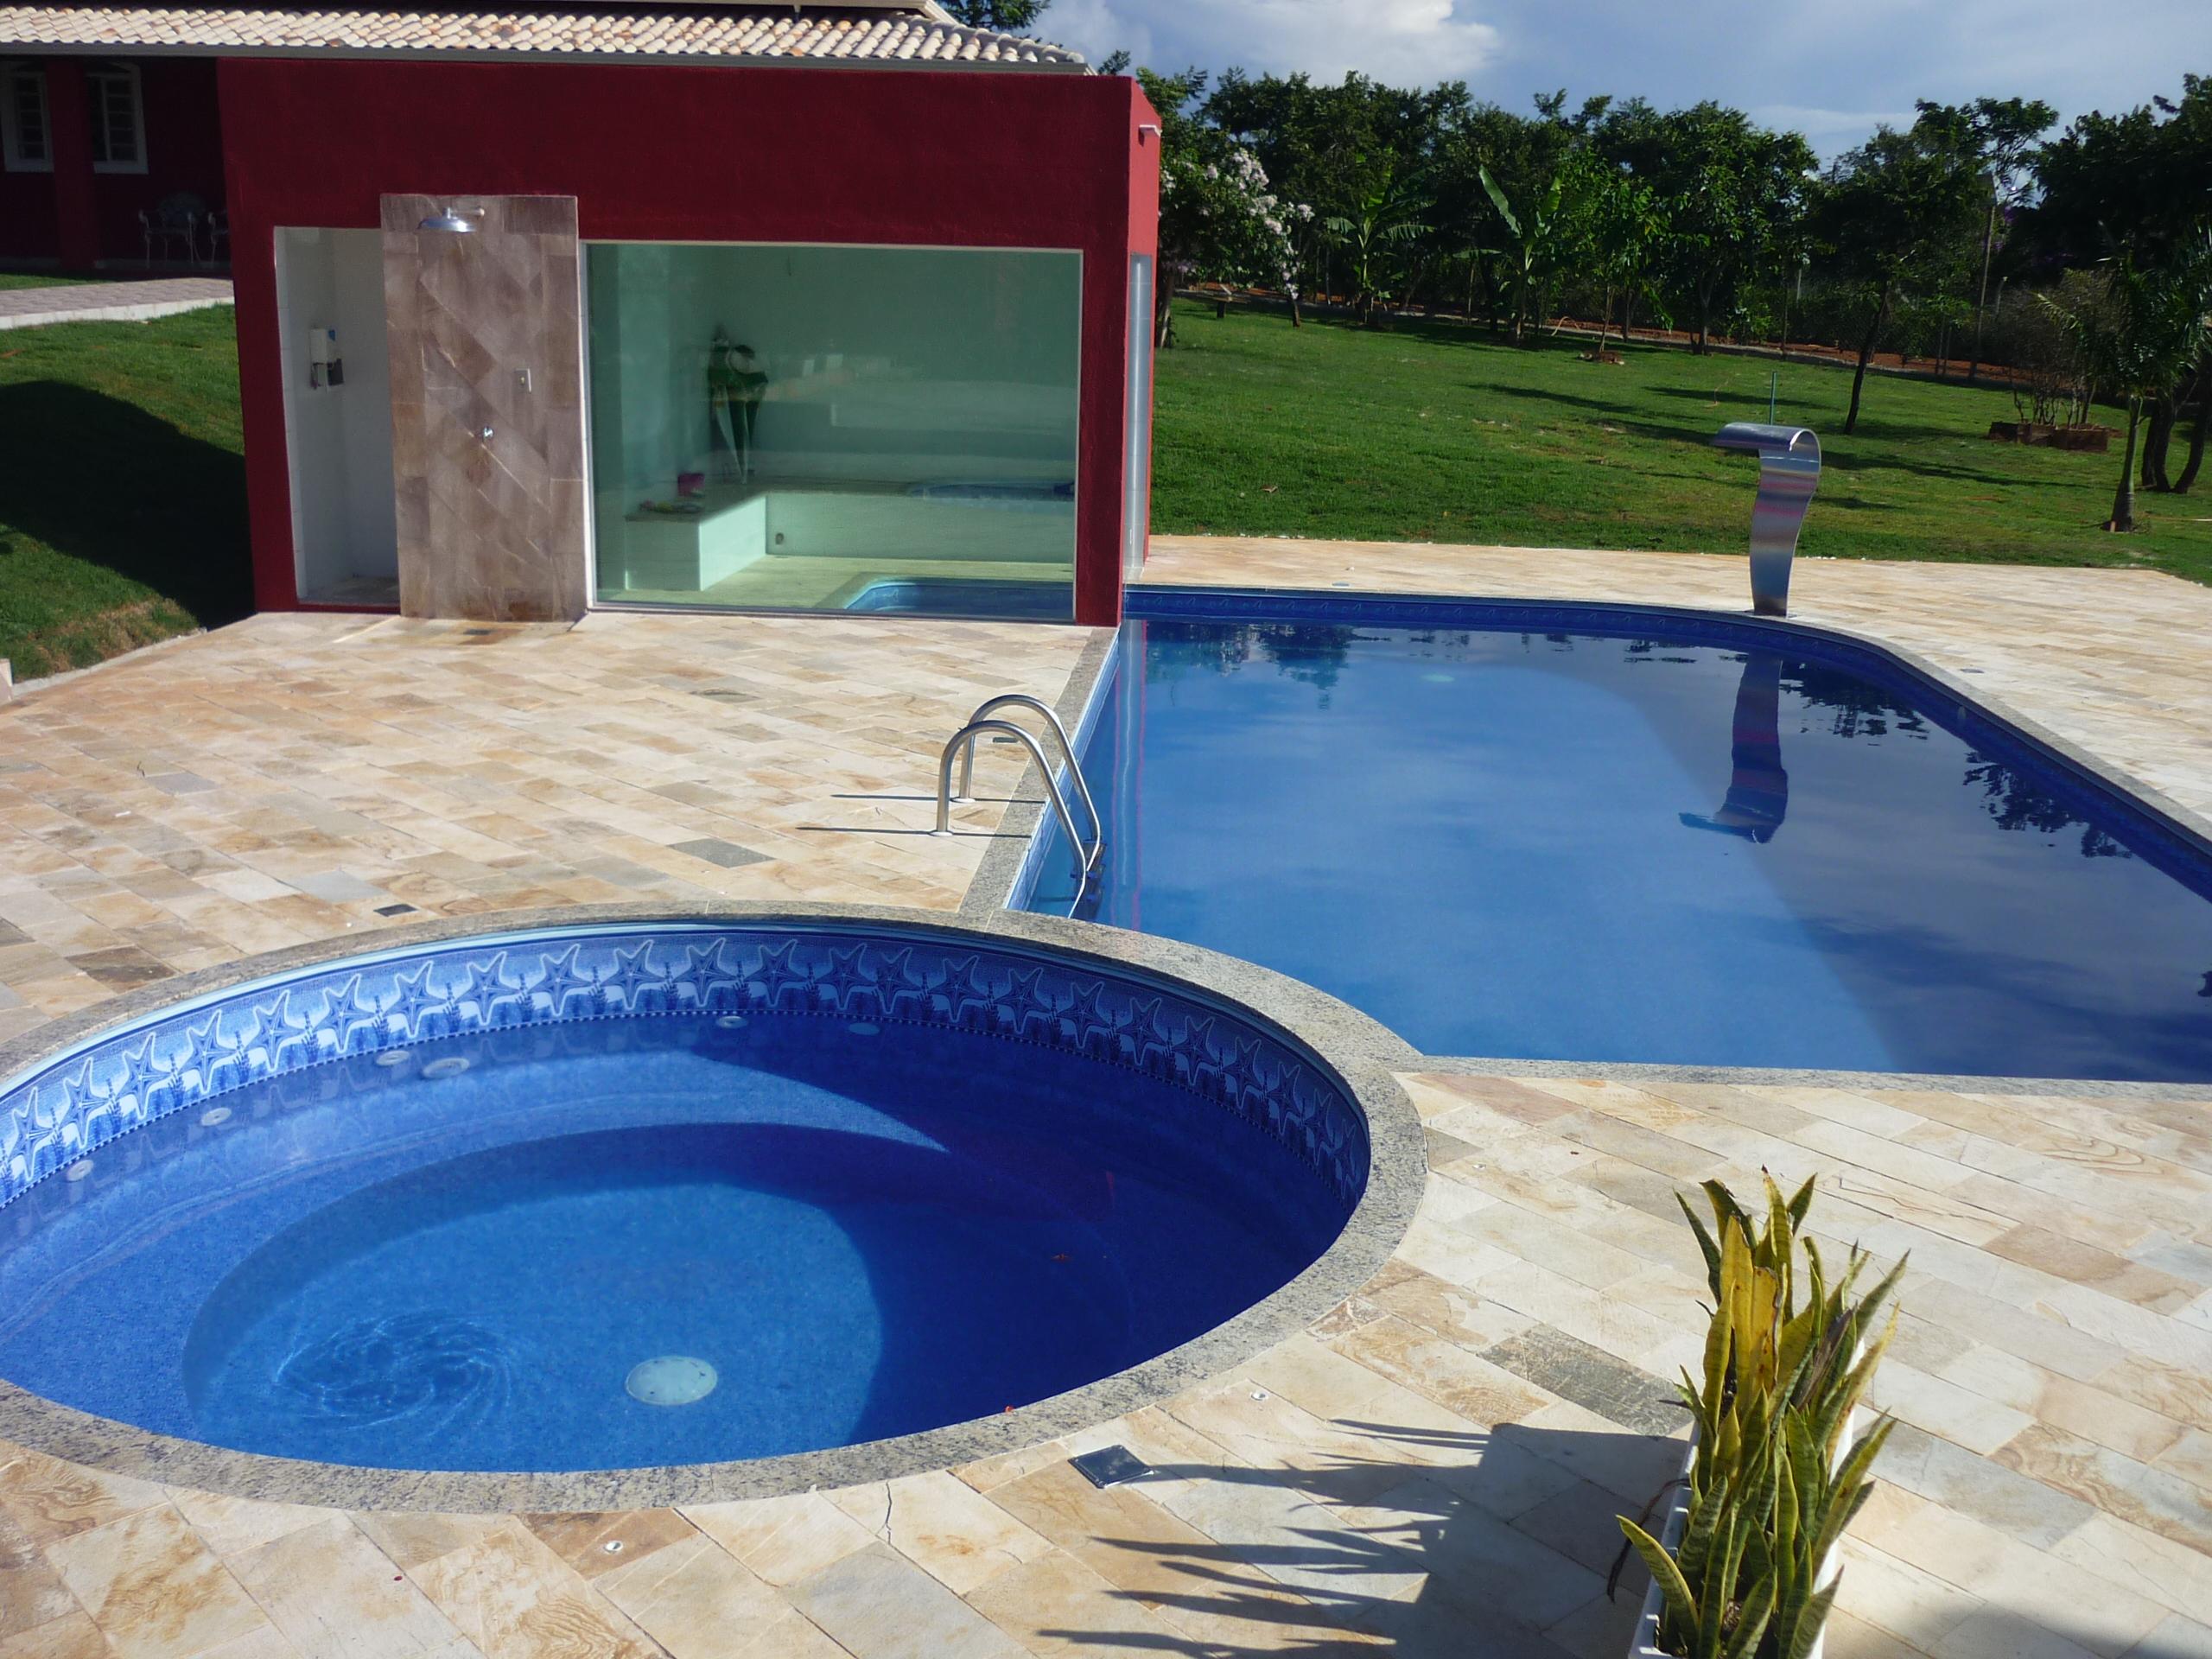 Projetos de piscinas for Fotos de modelos en piscinas